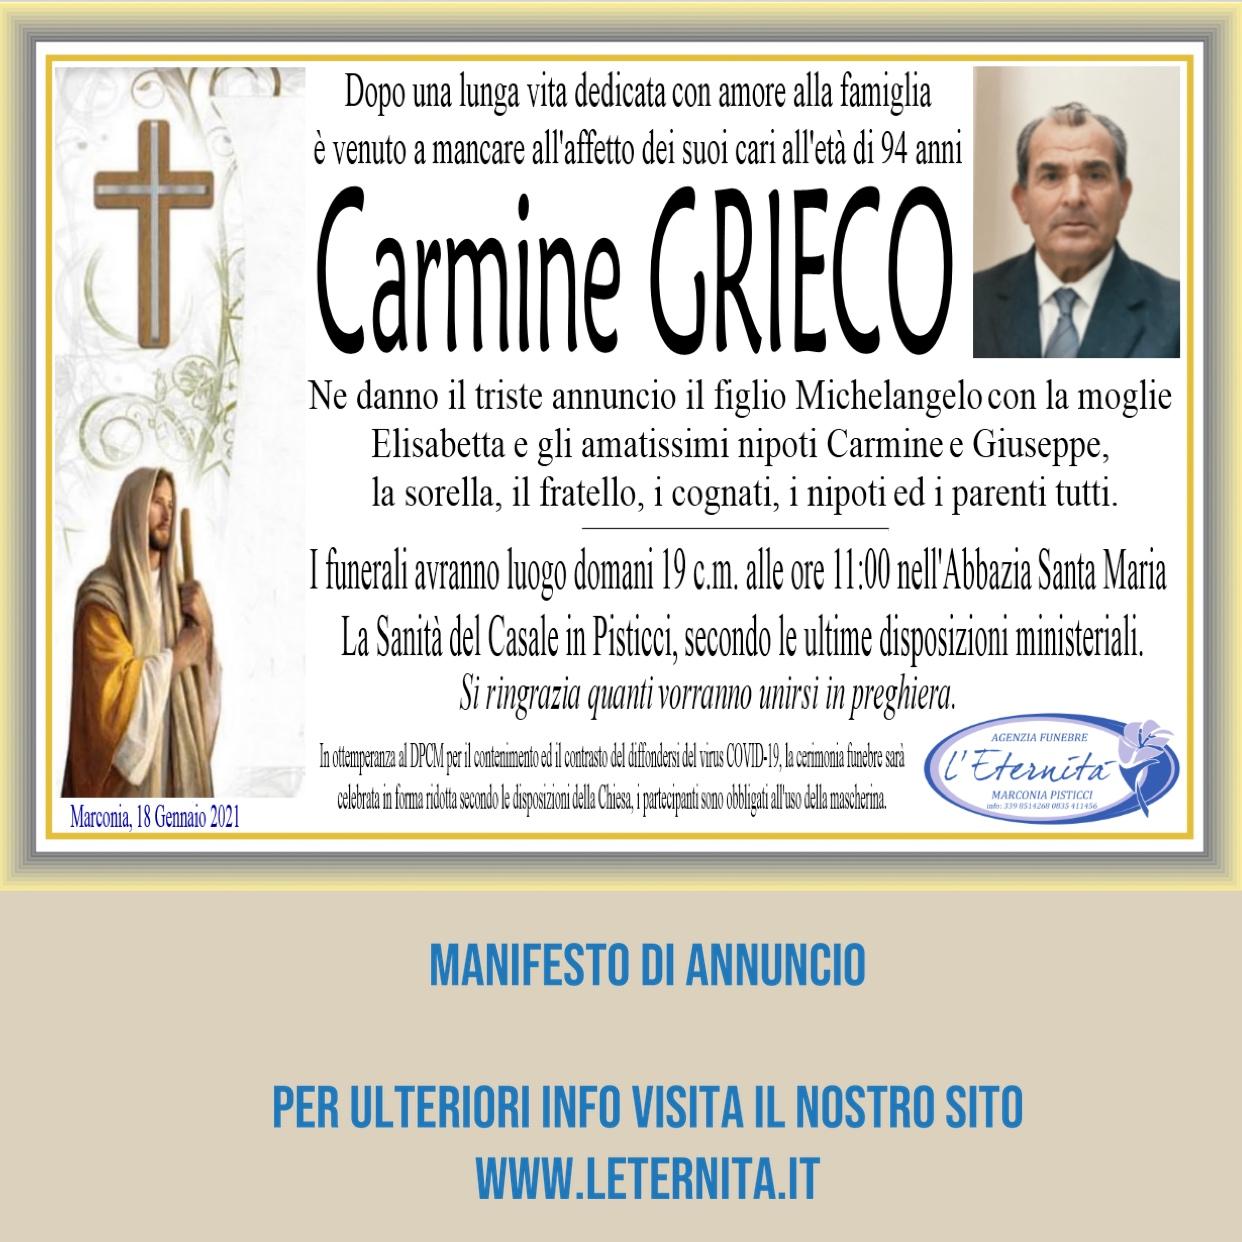 Carmine GRIECO